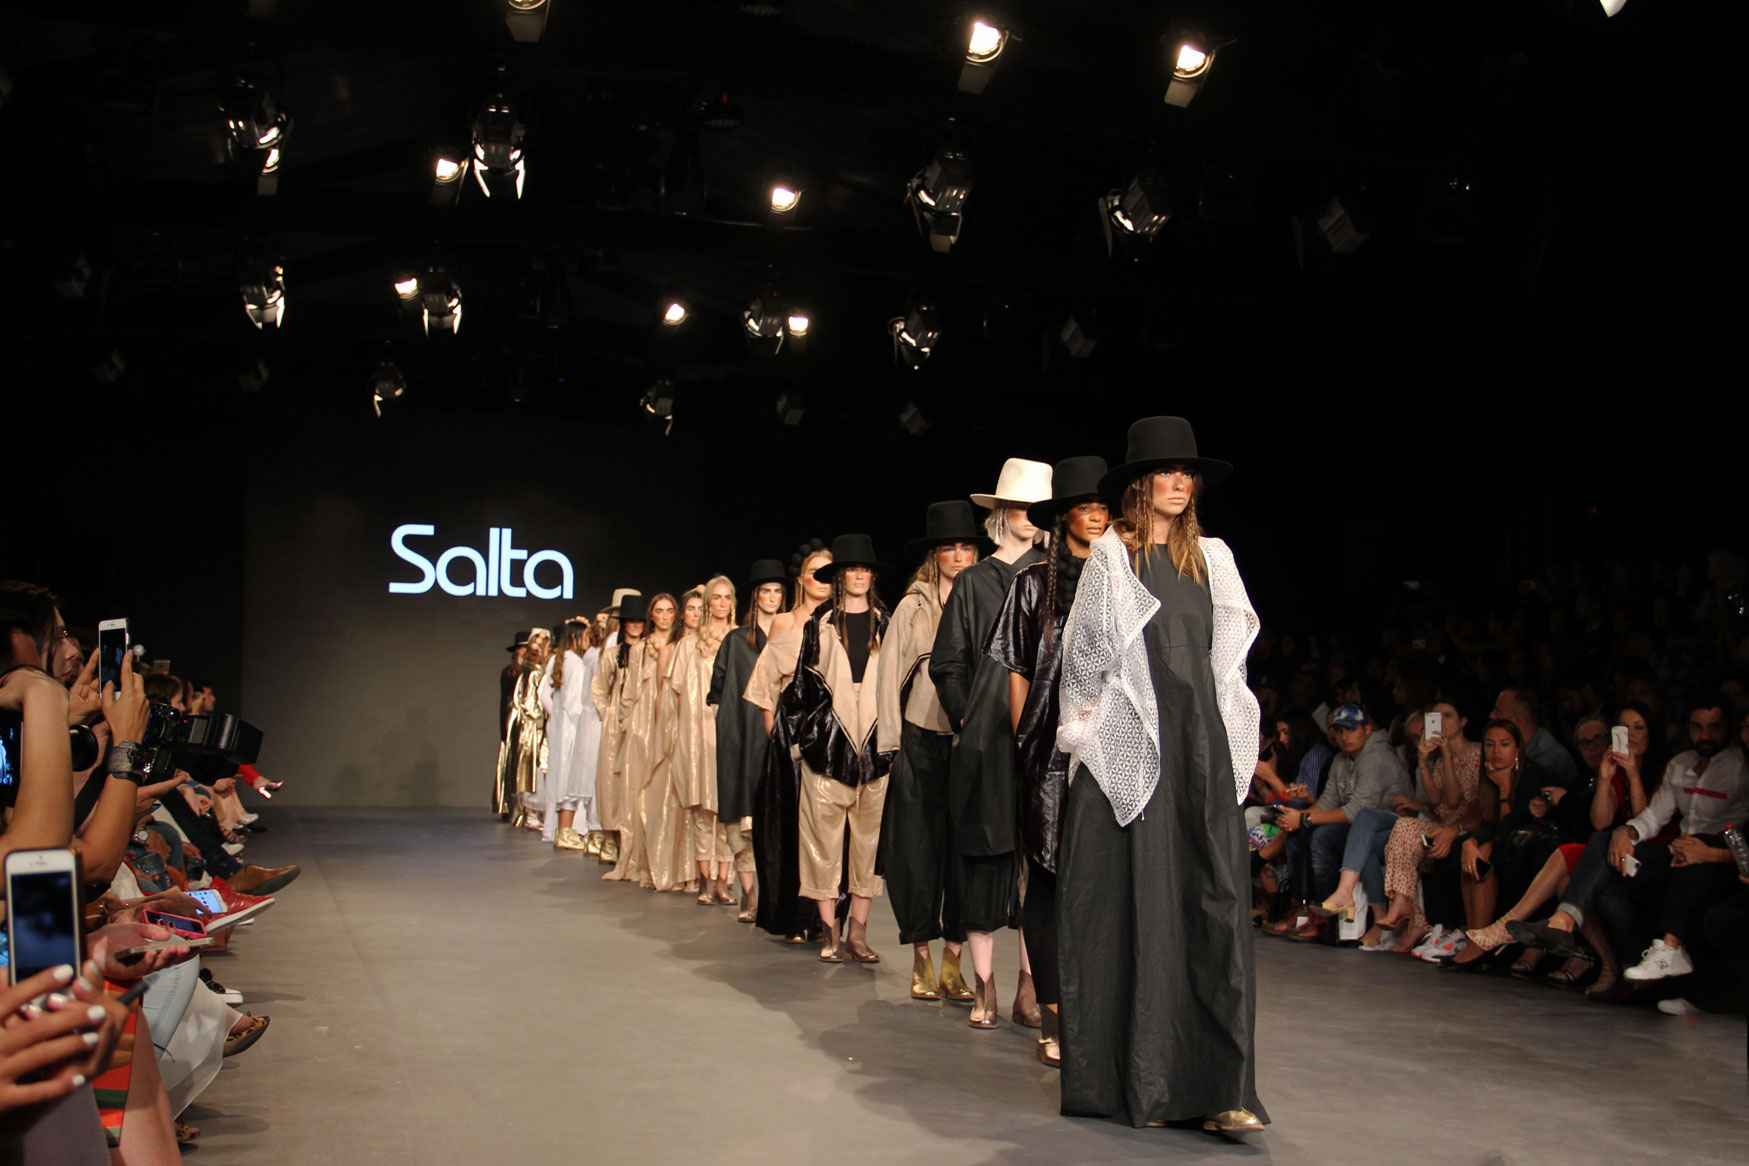 Salta Fall/Winter 2016 collection. Fashion Forward Season 7.